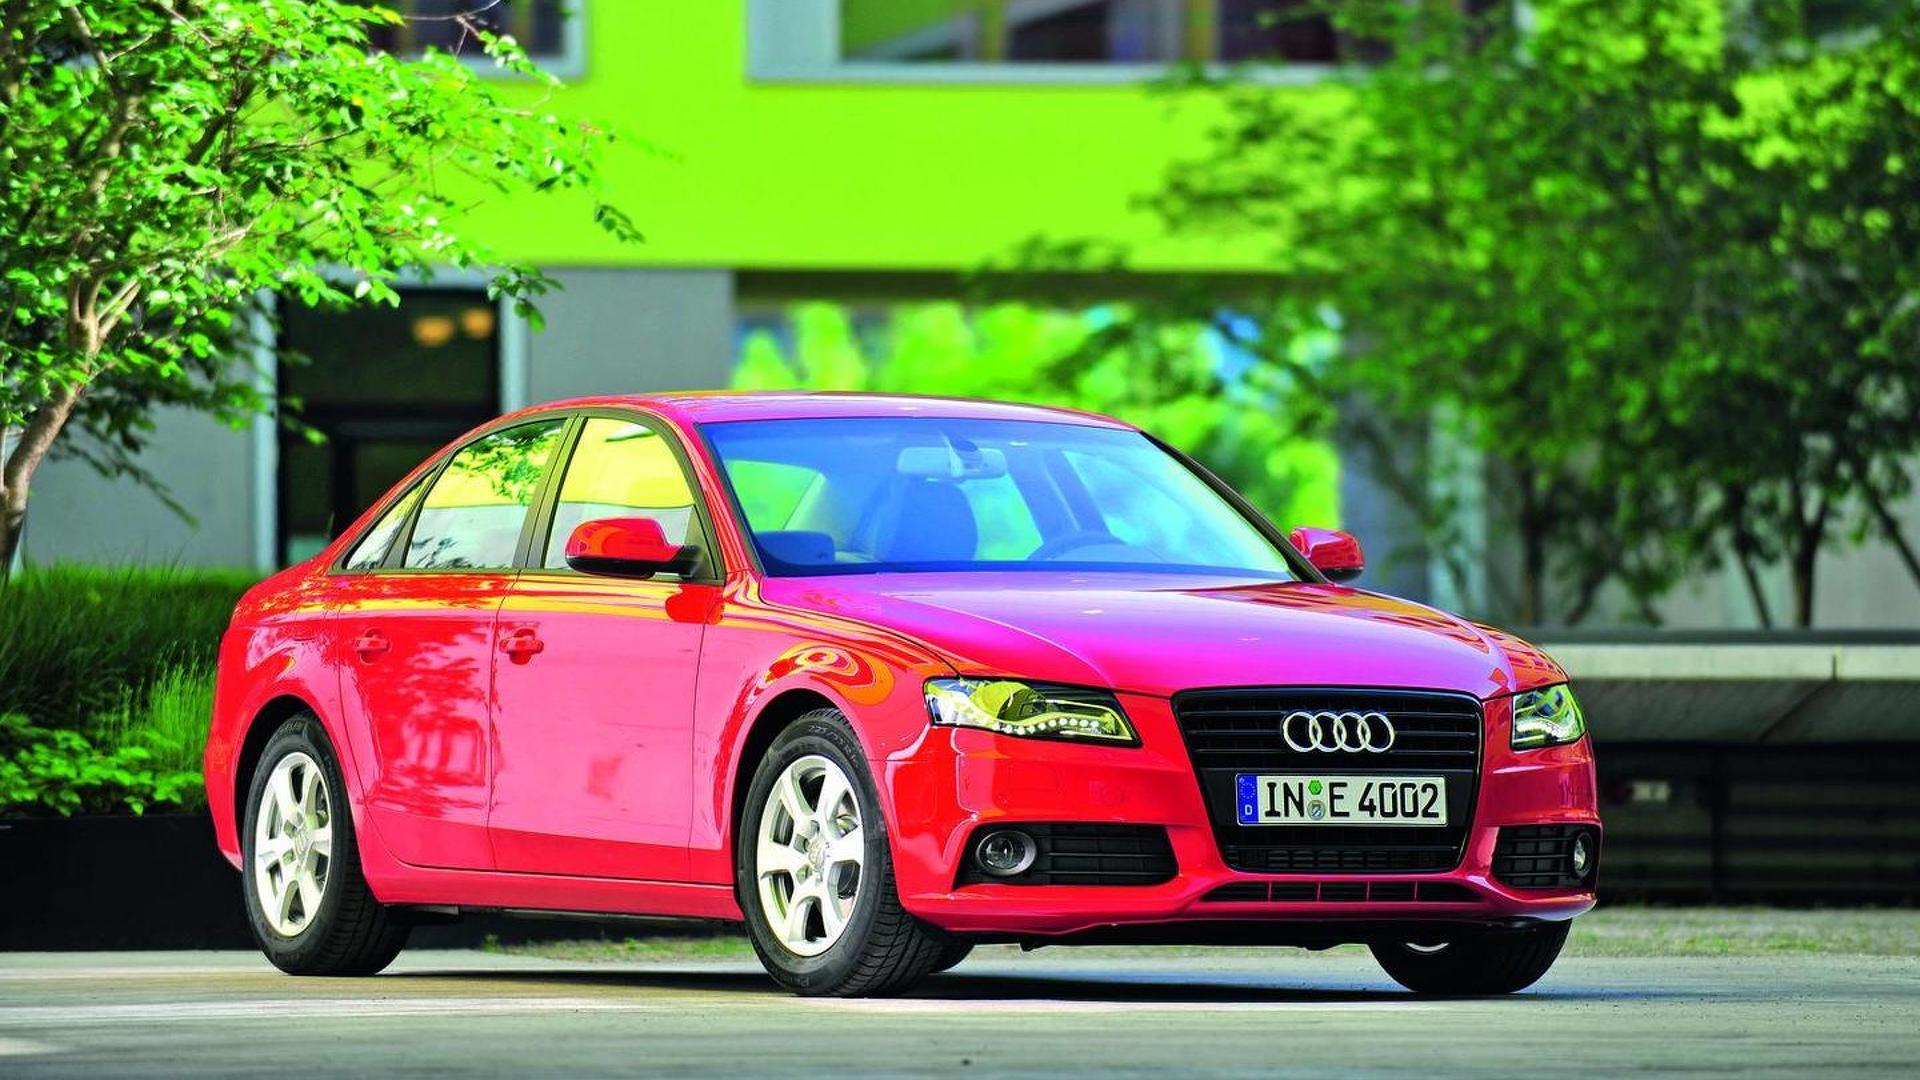 Audi launches A4 2.0 TDI - averages 4.4 L/100km